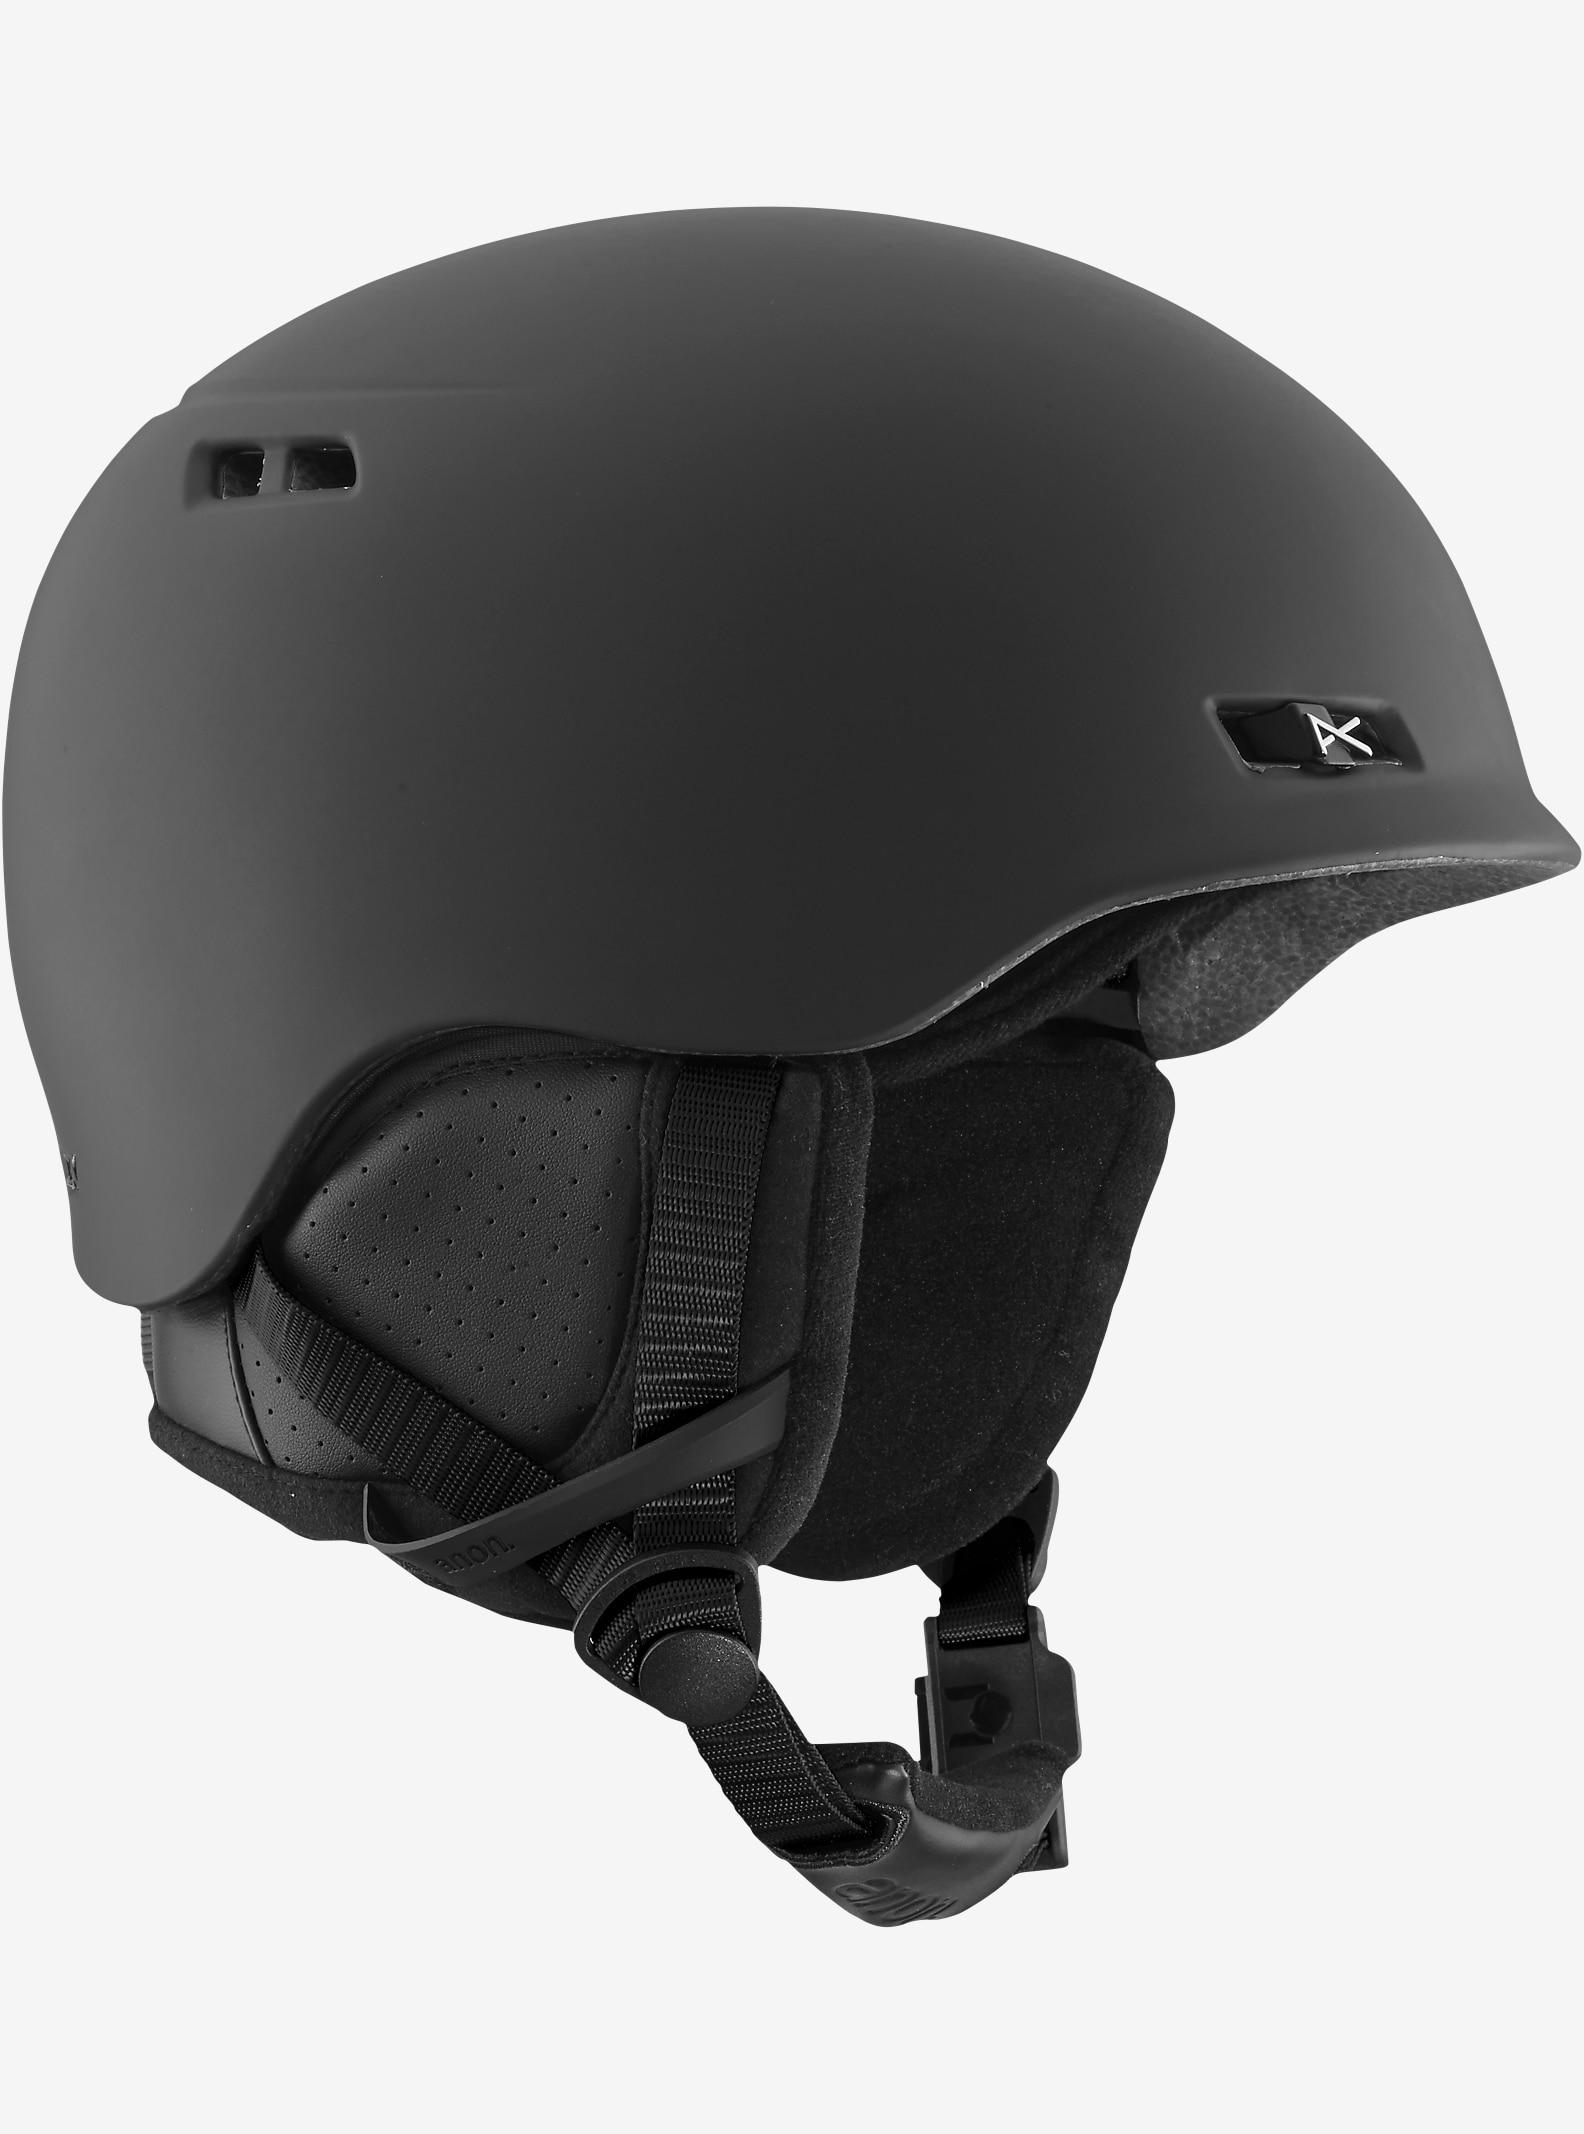 anon. Rodan Helmet shown in Black